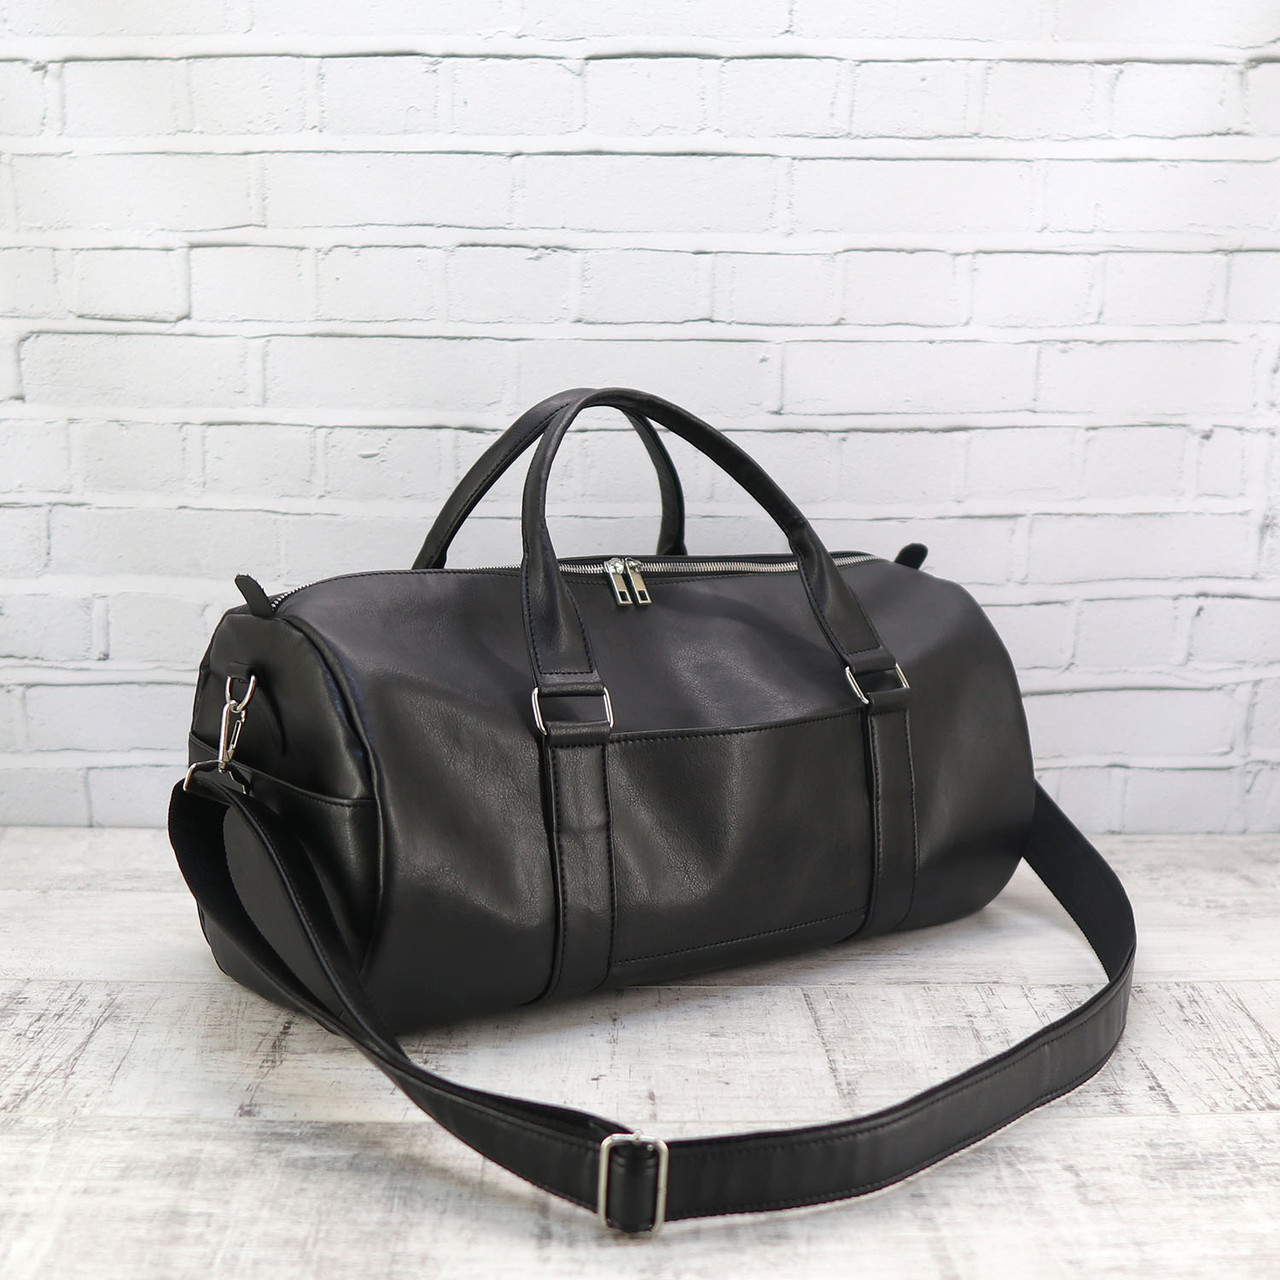 Дорожная сумка tube mini черная из эко кожи